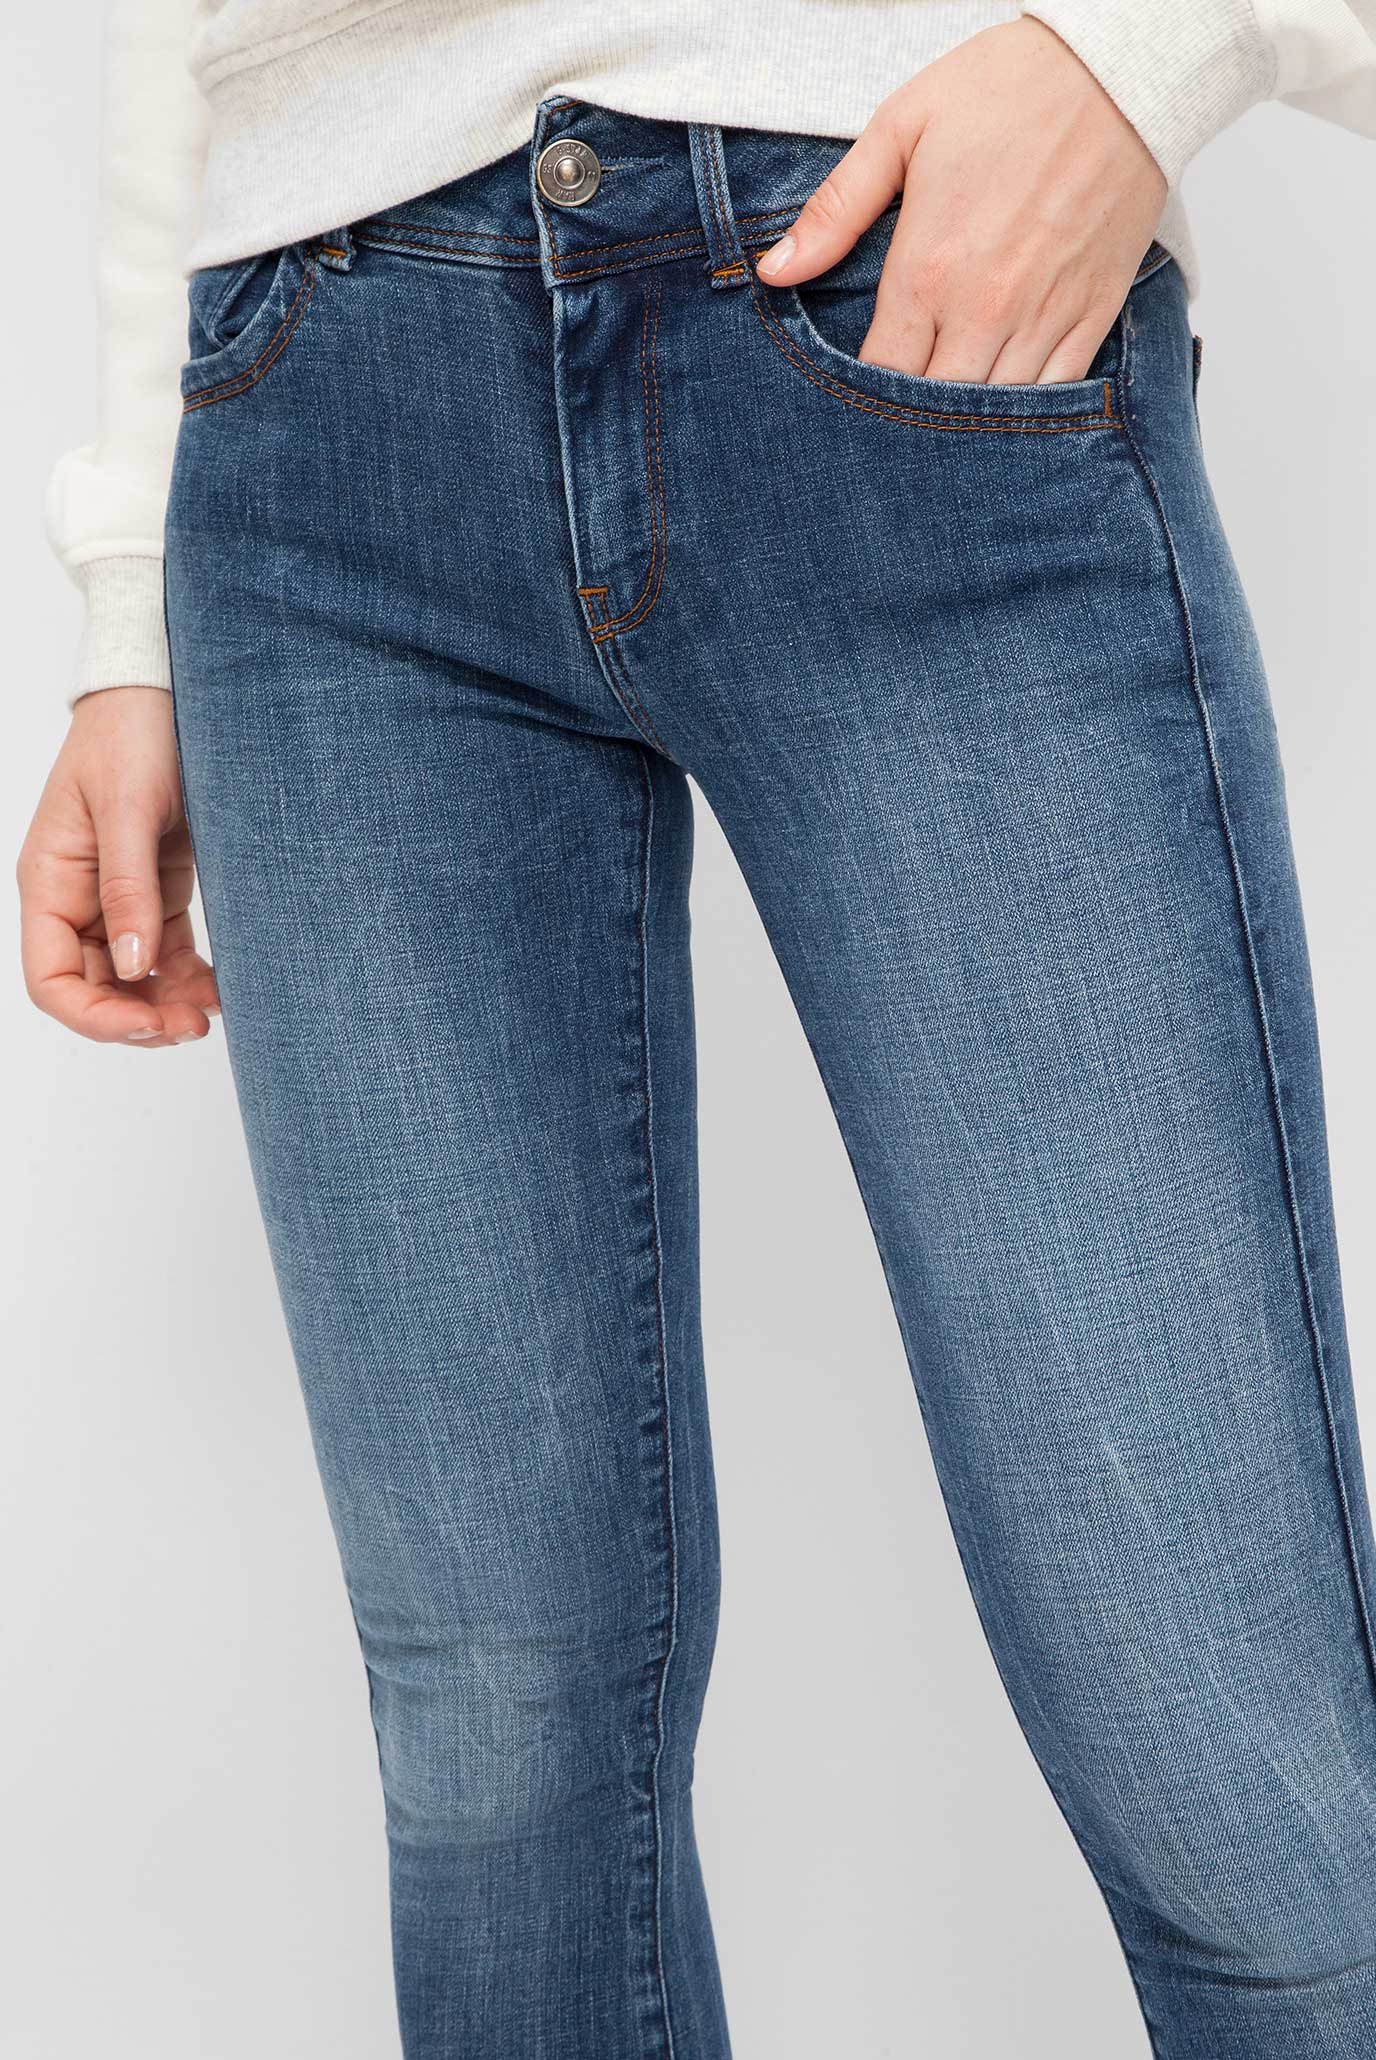 Женские синие джинсы LYNN G-Star RAW